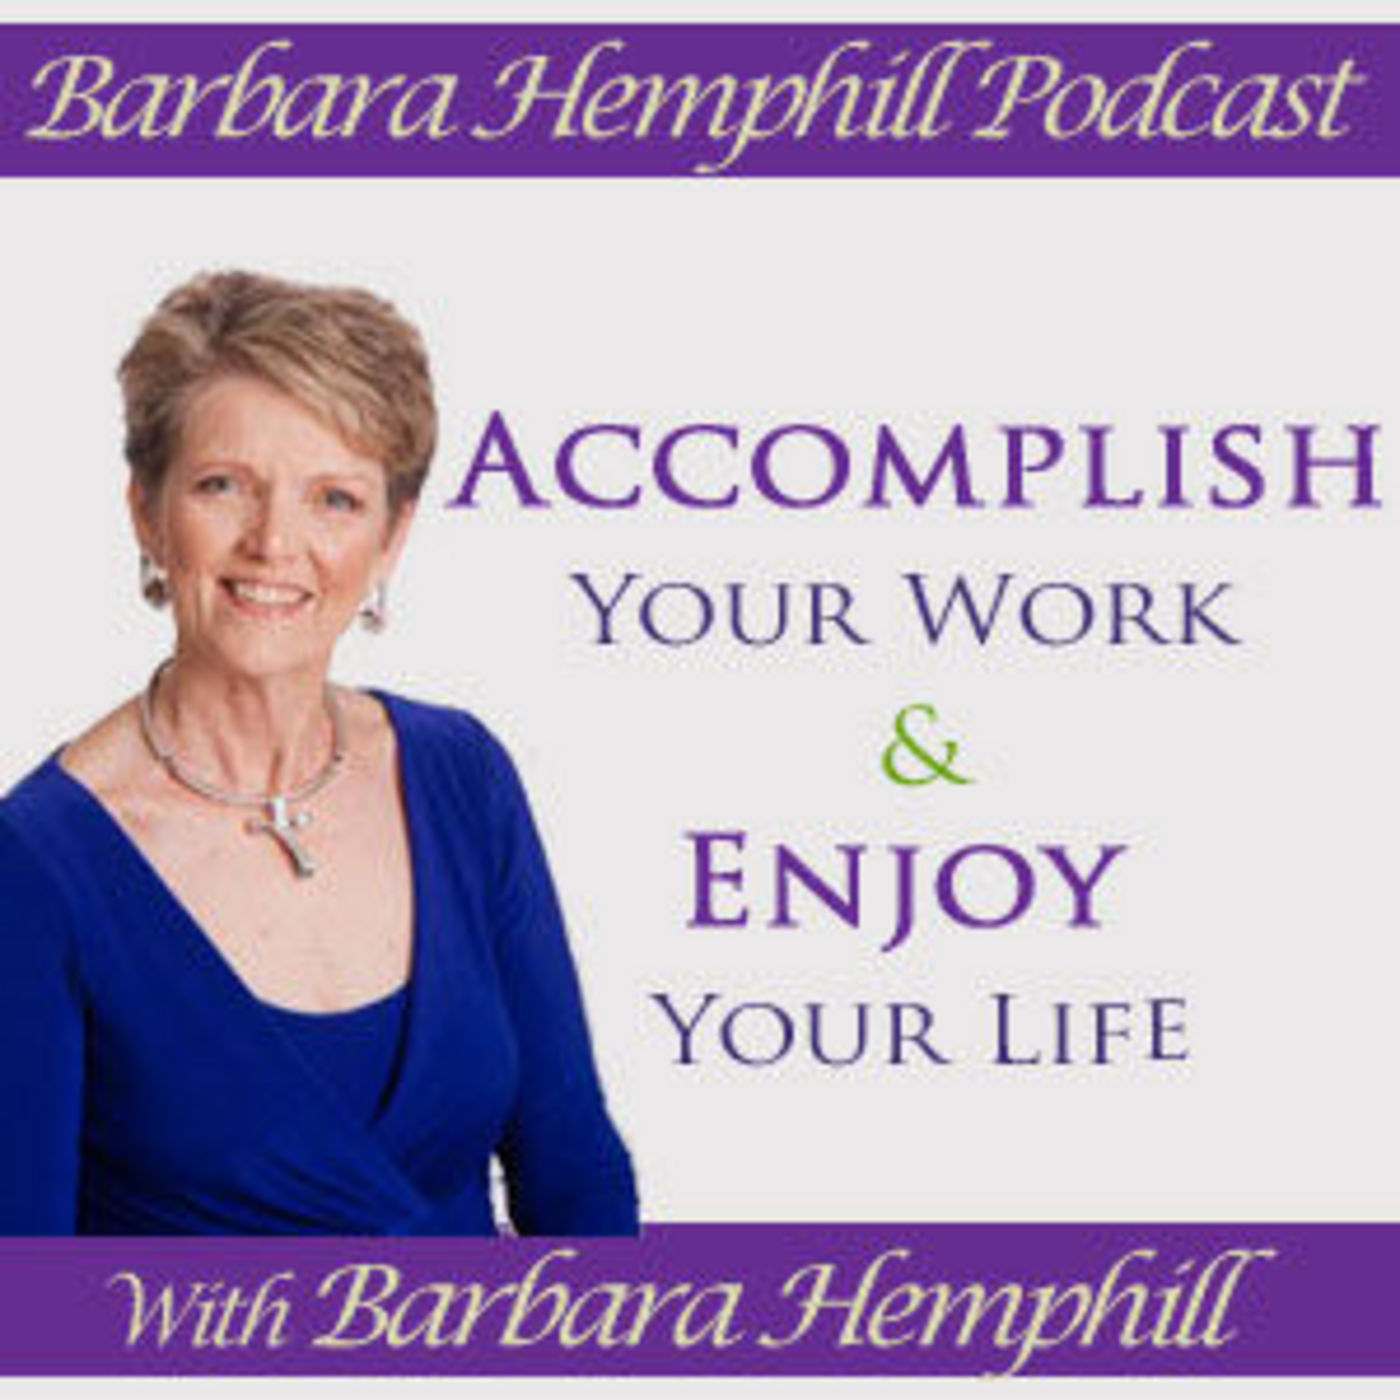 <![CDATA[Barbara Hemphill Podcast]]>